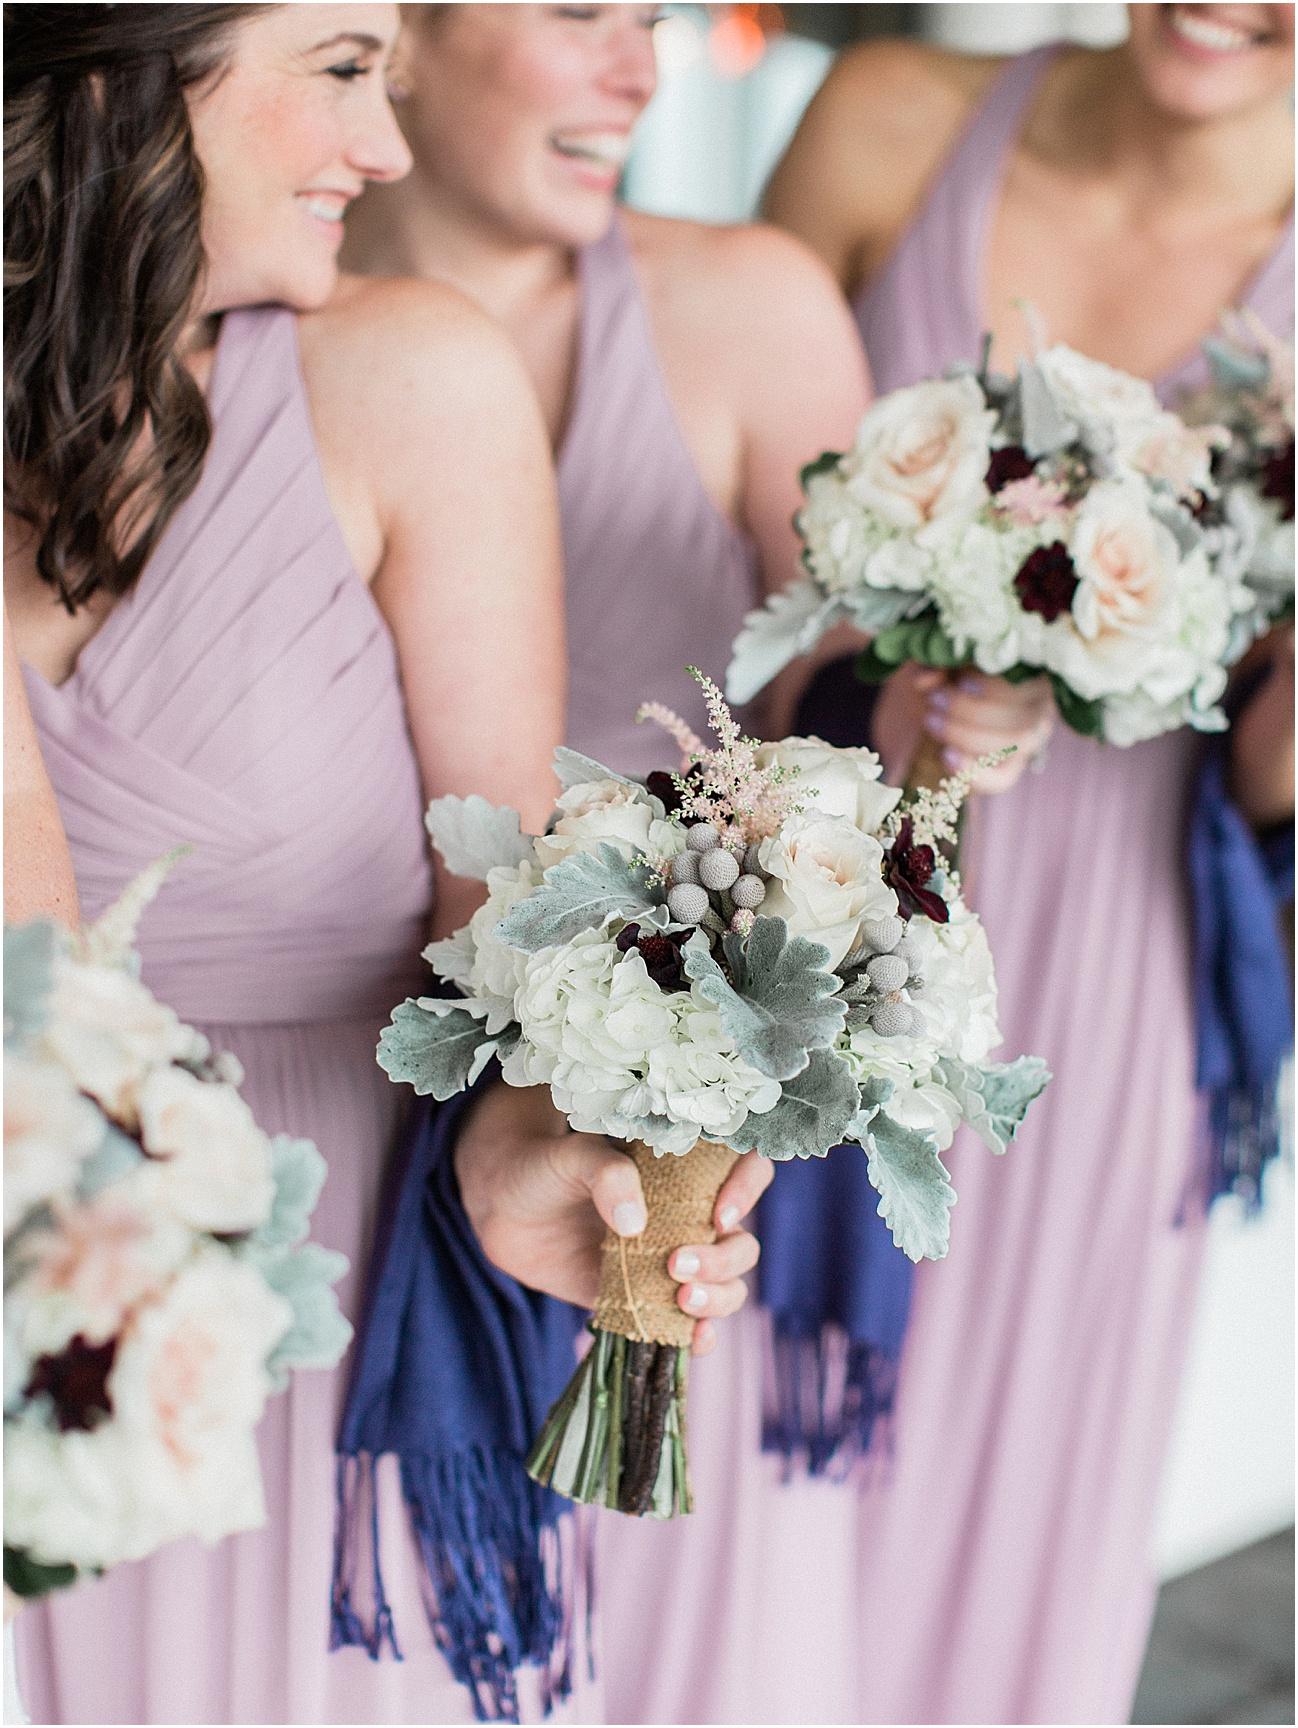 danielle_sean_willowbend_rain_rainy_day_cape_cod_boston_wedding_photographer_meredith_jane_photography_photo_1680.jpg